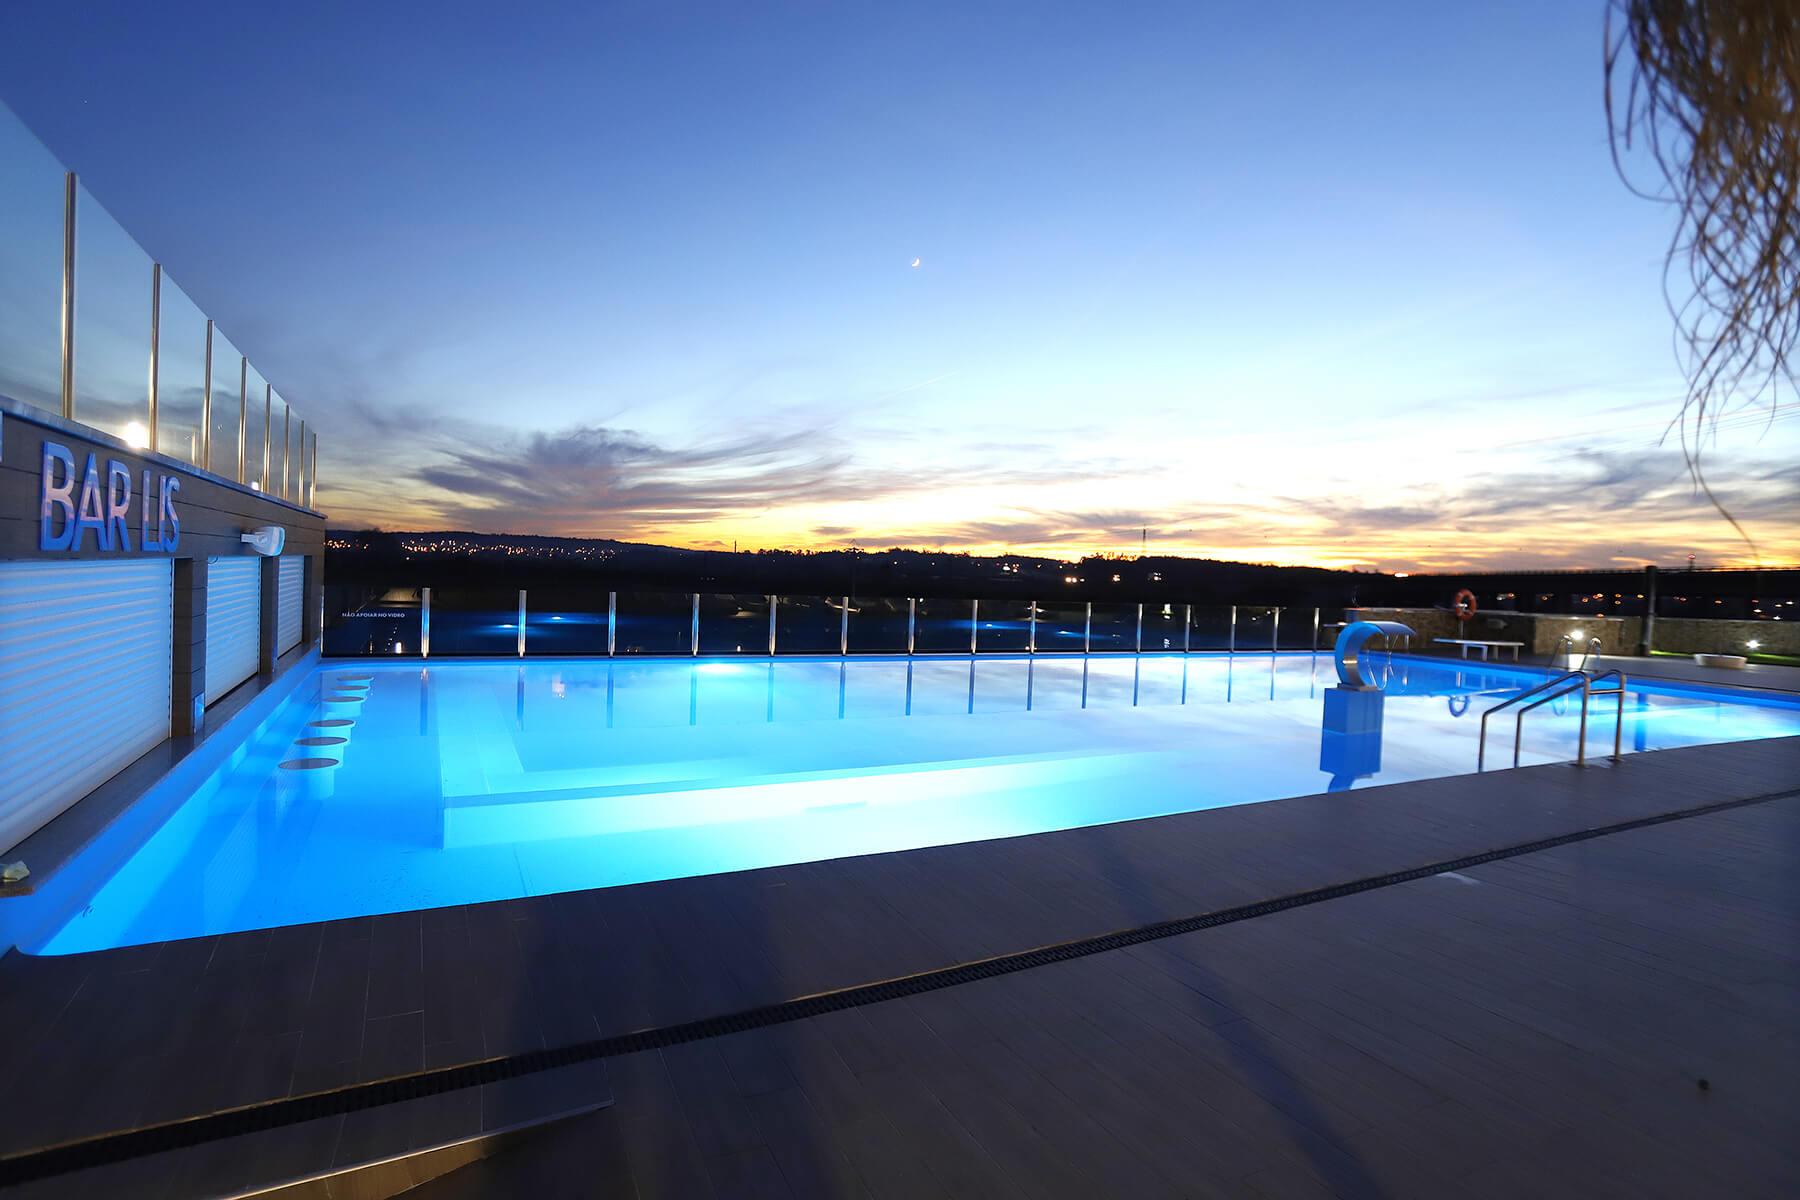 Piscina Exterior - Lisotel Hotel e Spa